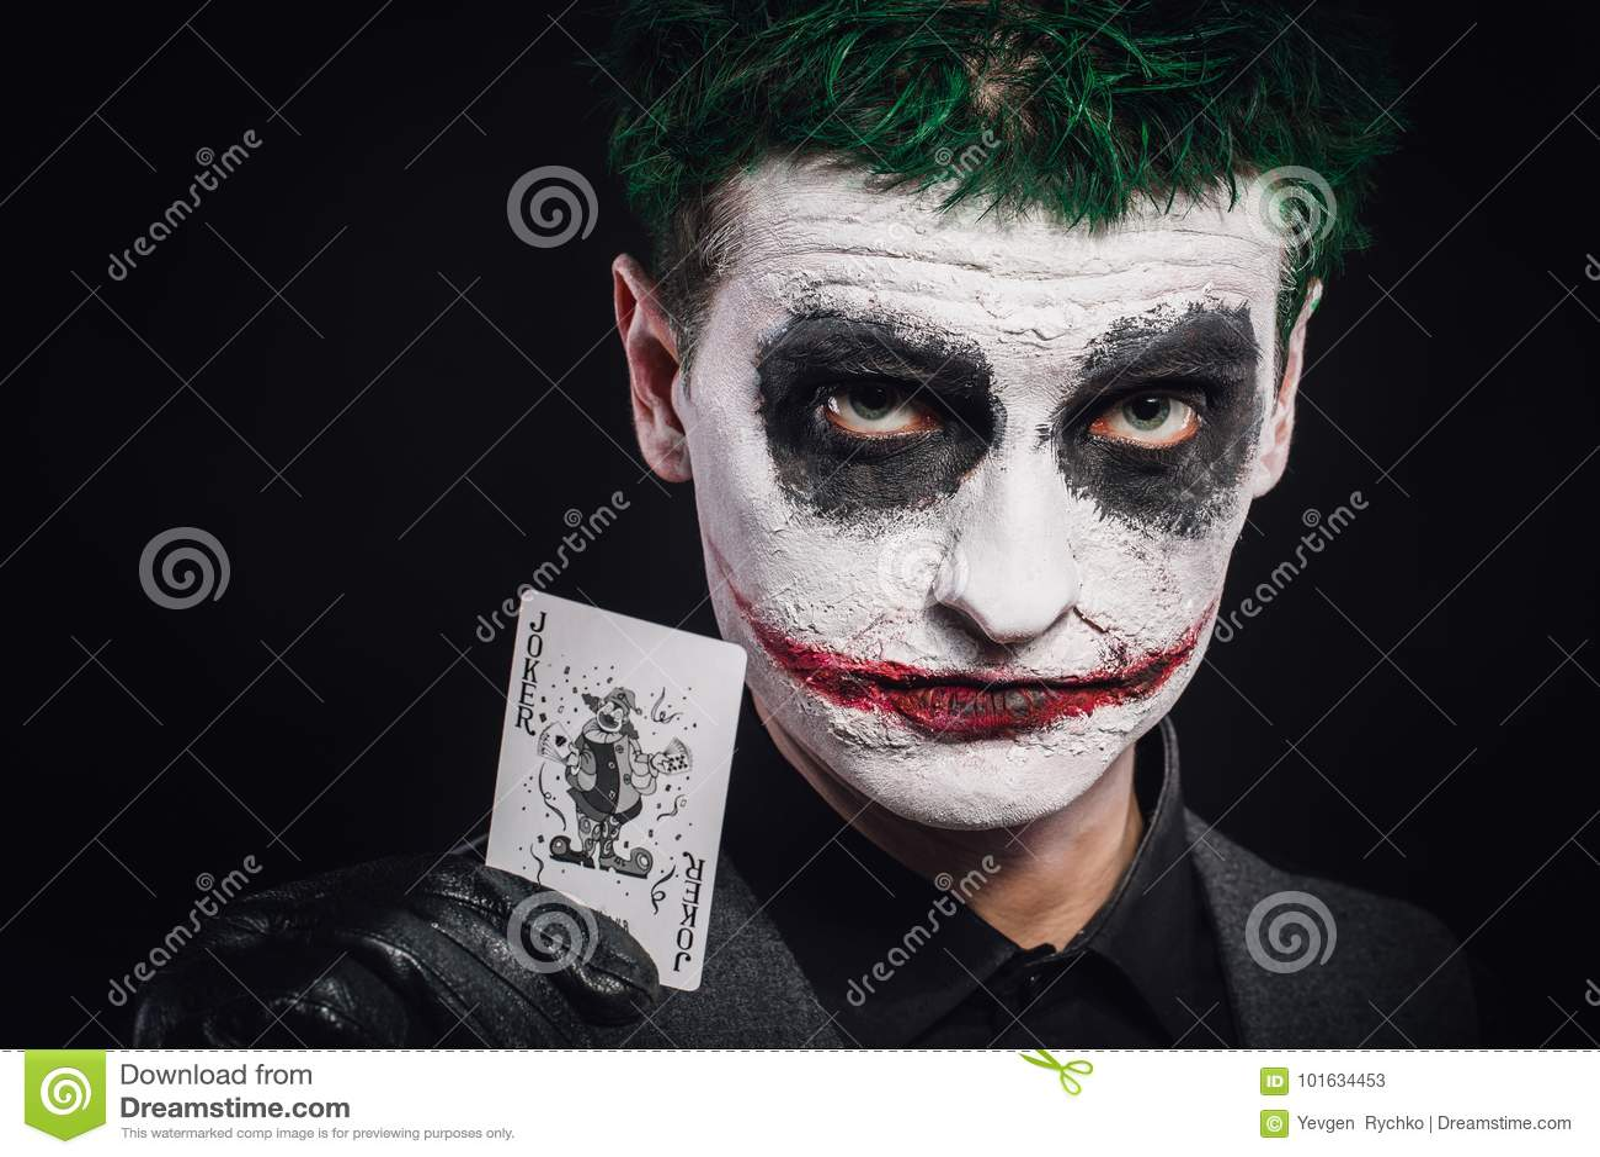 Halloween Joker Card.Crazy Joker Face Halloween Stock Image Image Of Card Green